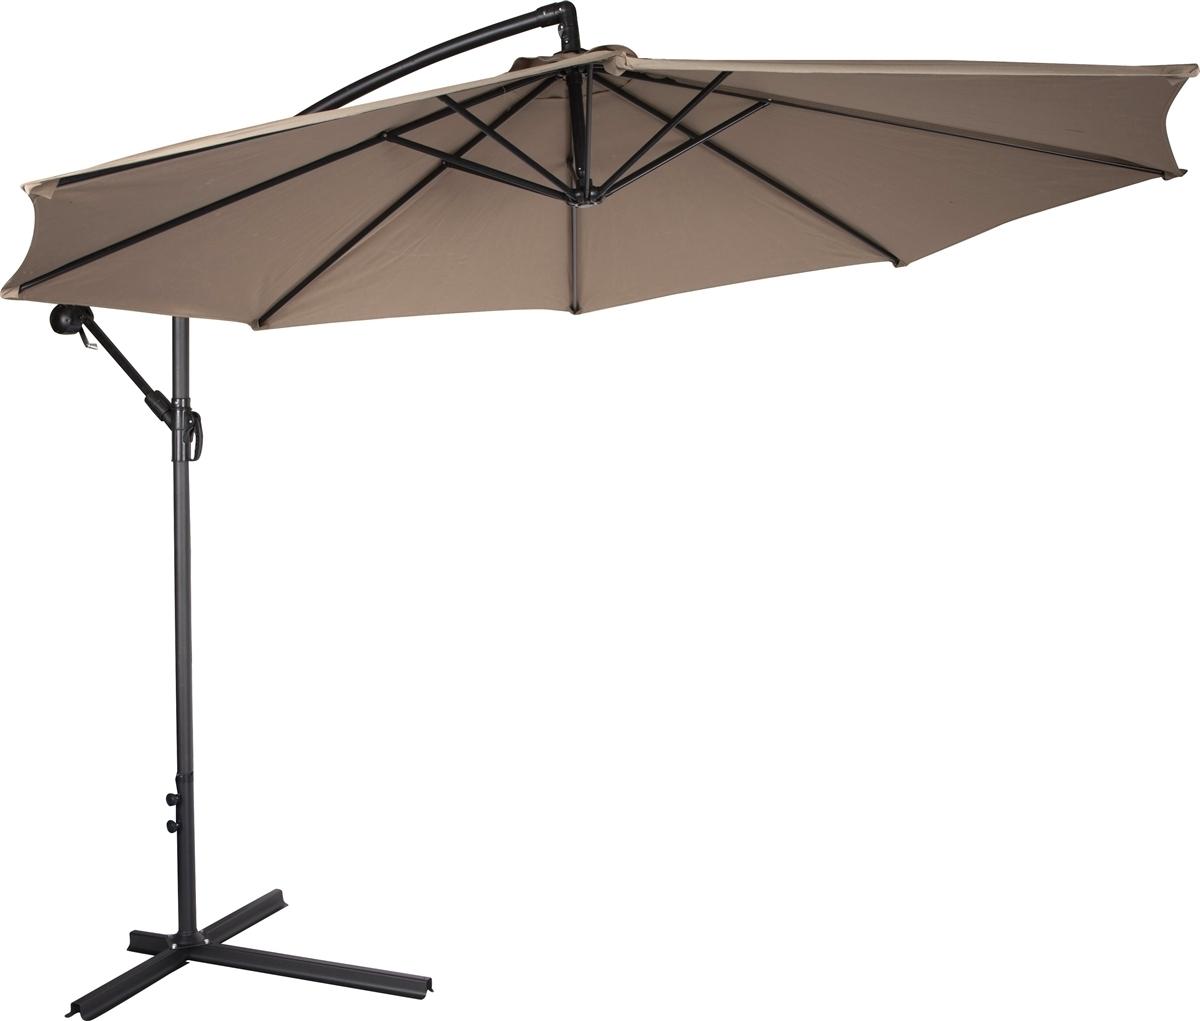 Popular Custom Sunbrella Patio Umbrellas Intended For Buy Patio Umbrellas Custom Printed Square Canopy Market Umbrella (View 15 of 20)